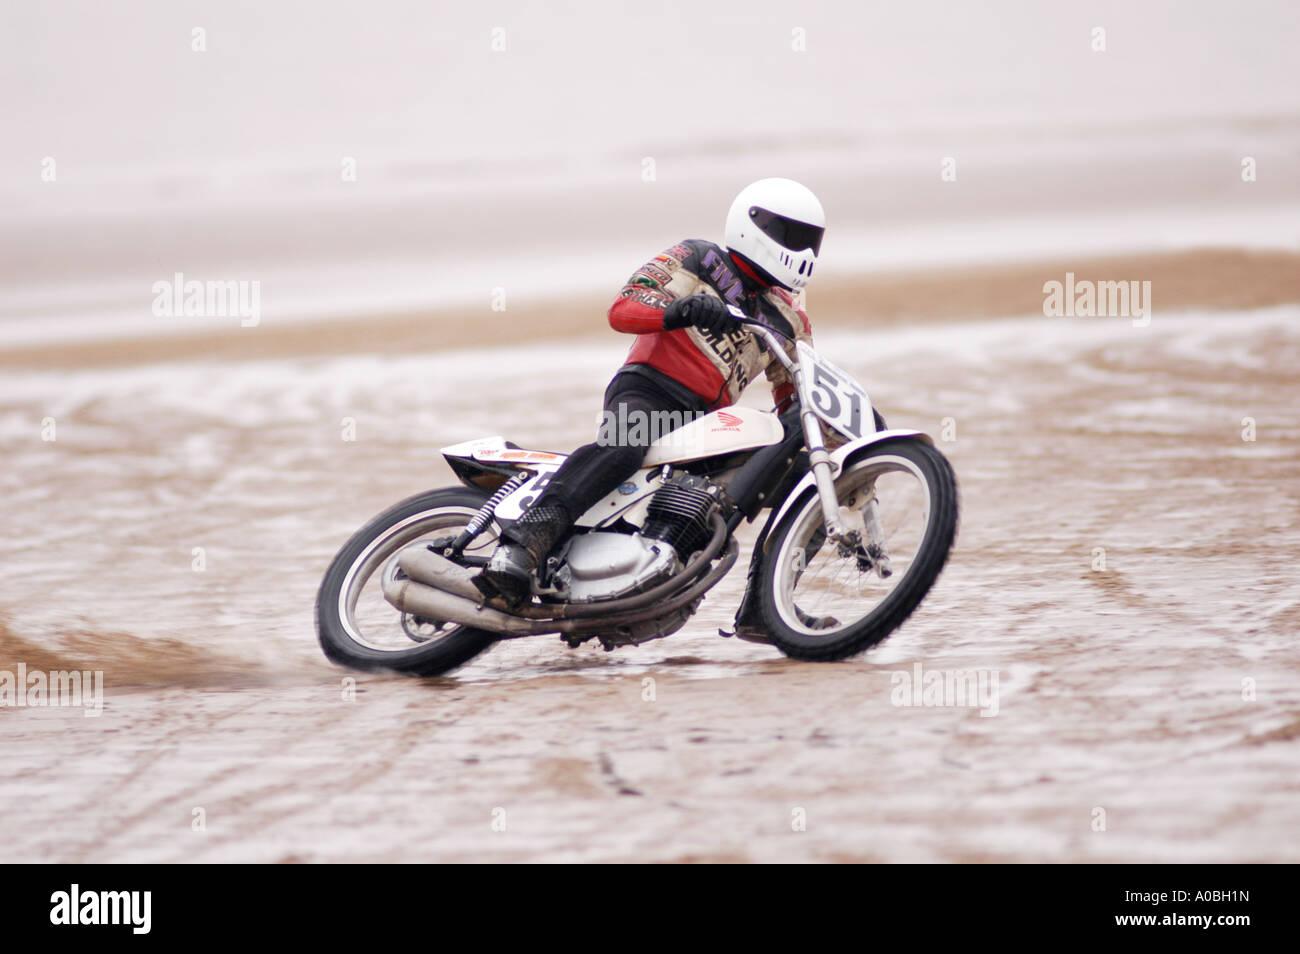 Speedway Motorcycle Racing Bikes: Sand Racer On Honda Speedway Bike Sand Racing On A Beach